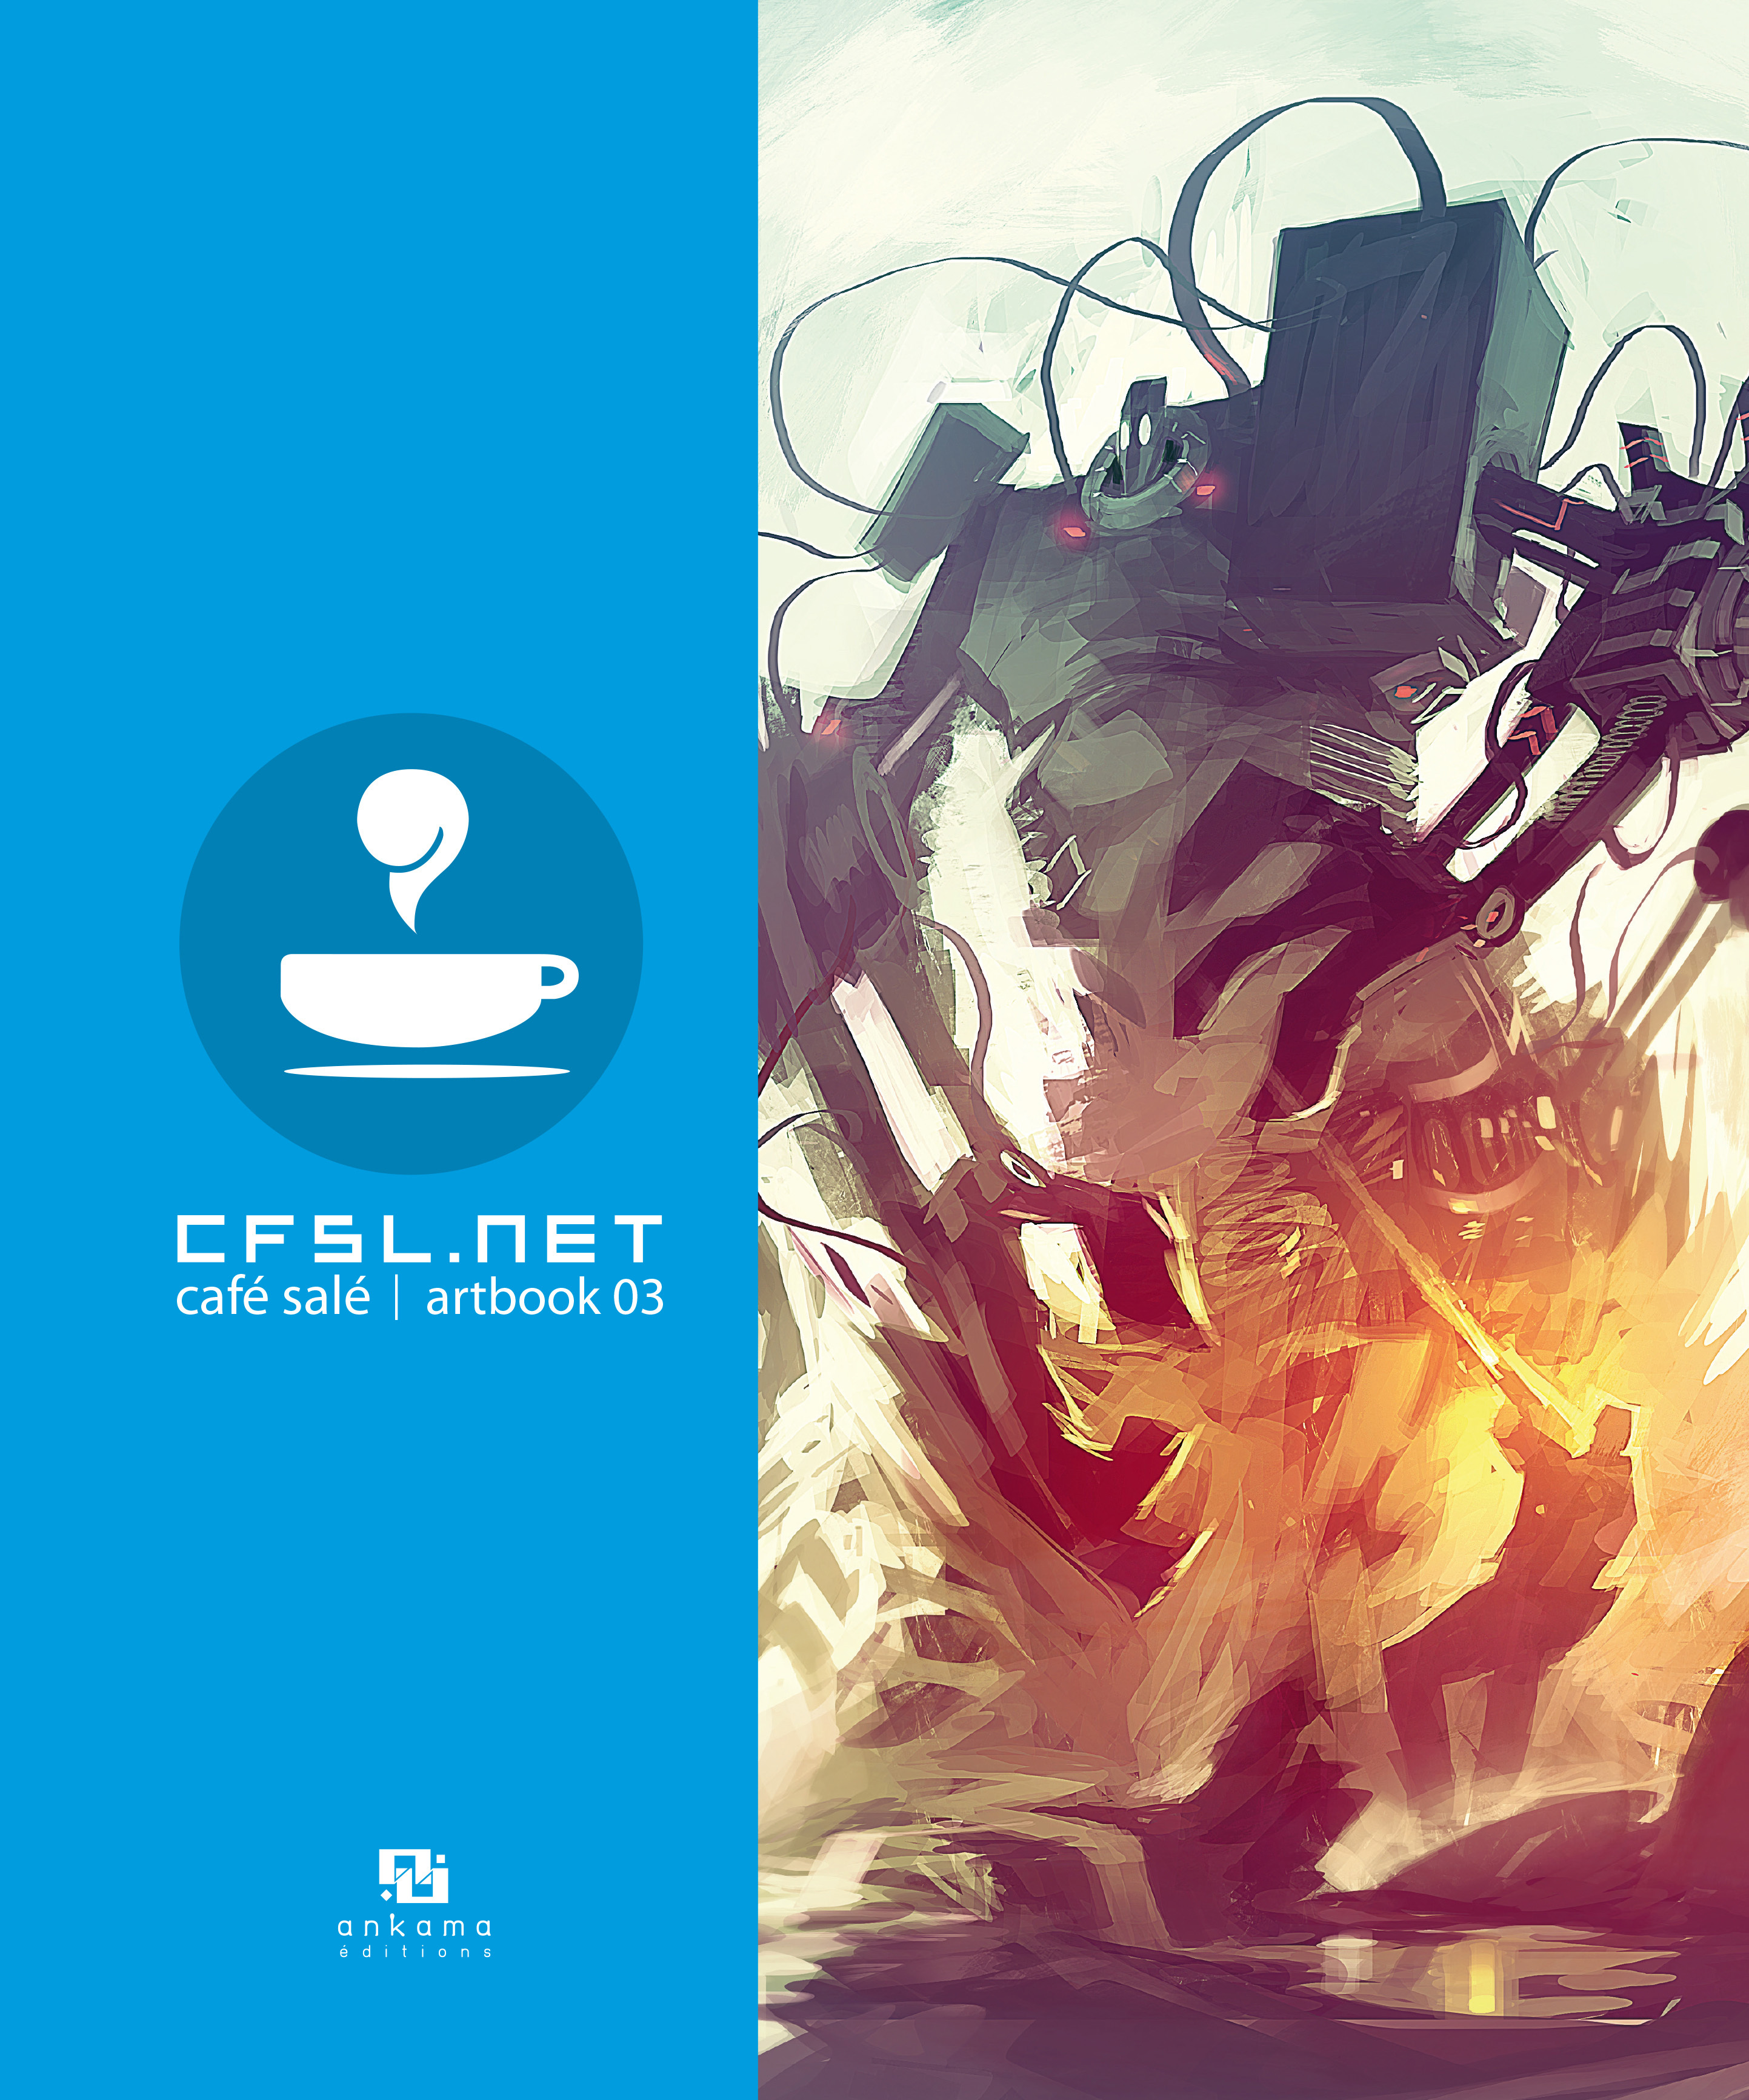 CFSL.NET CAFE SALE ARTBOOK T03